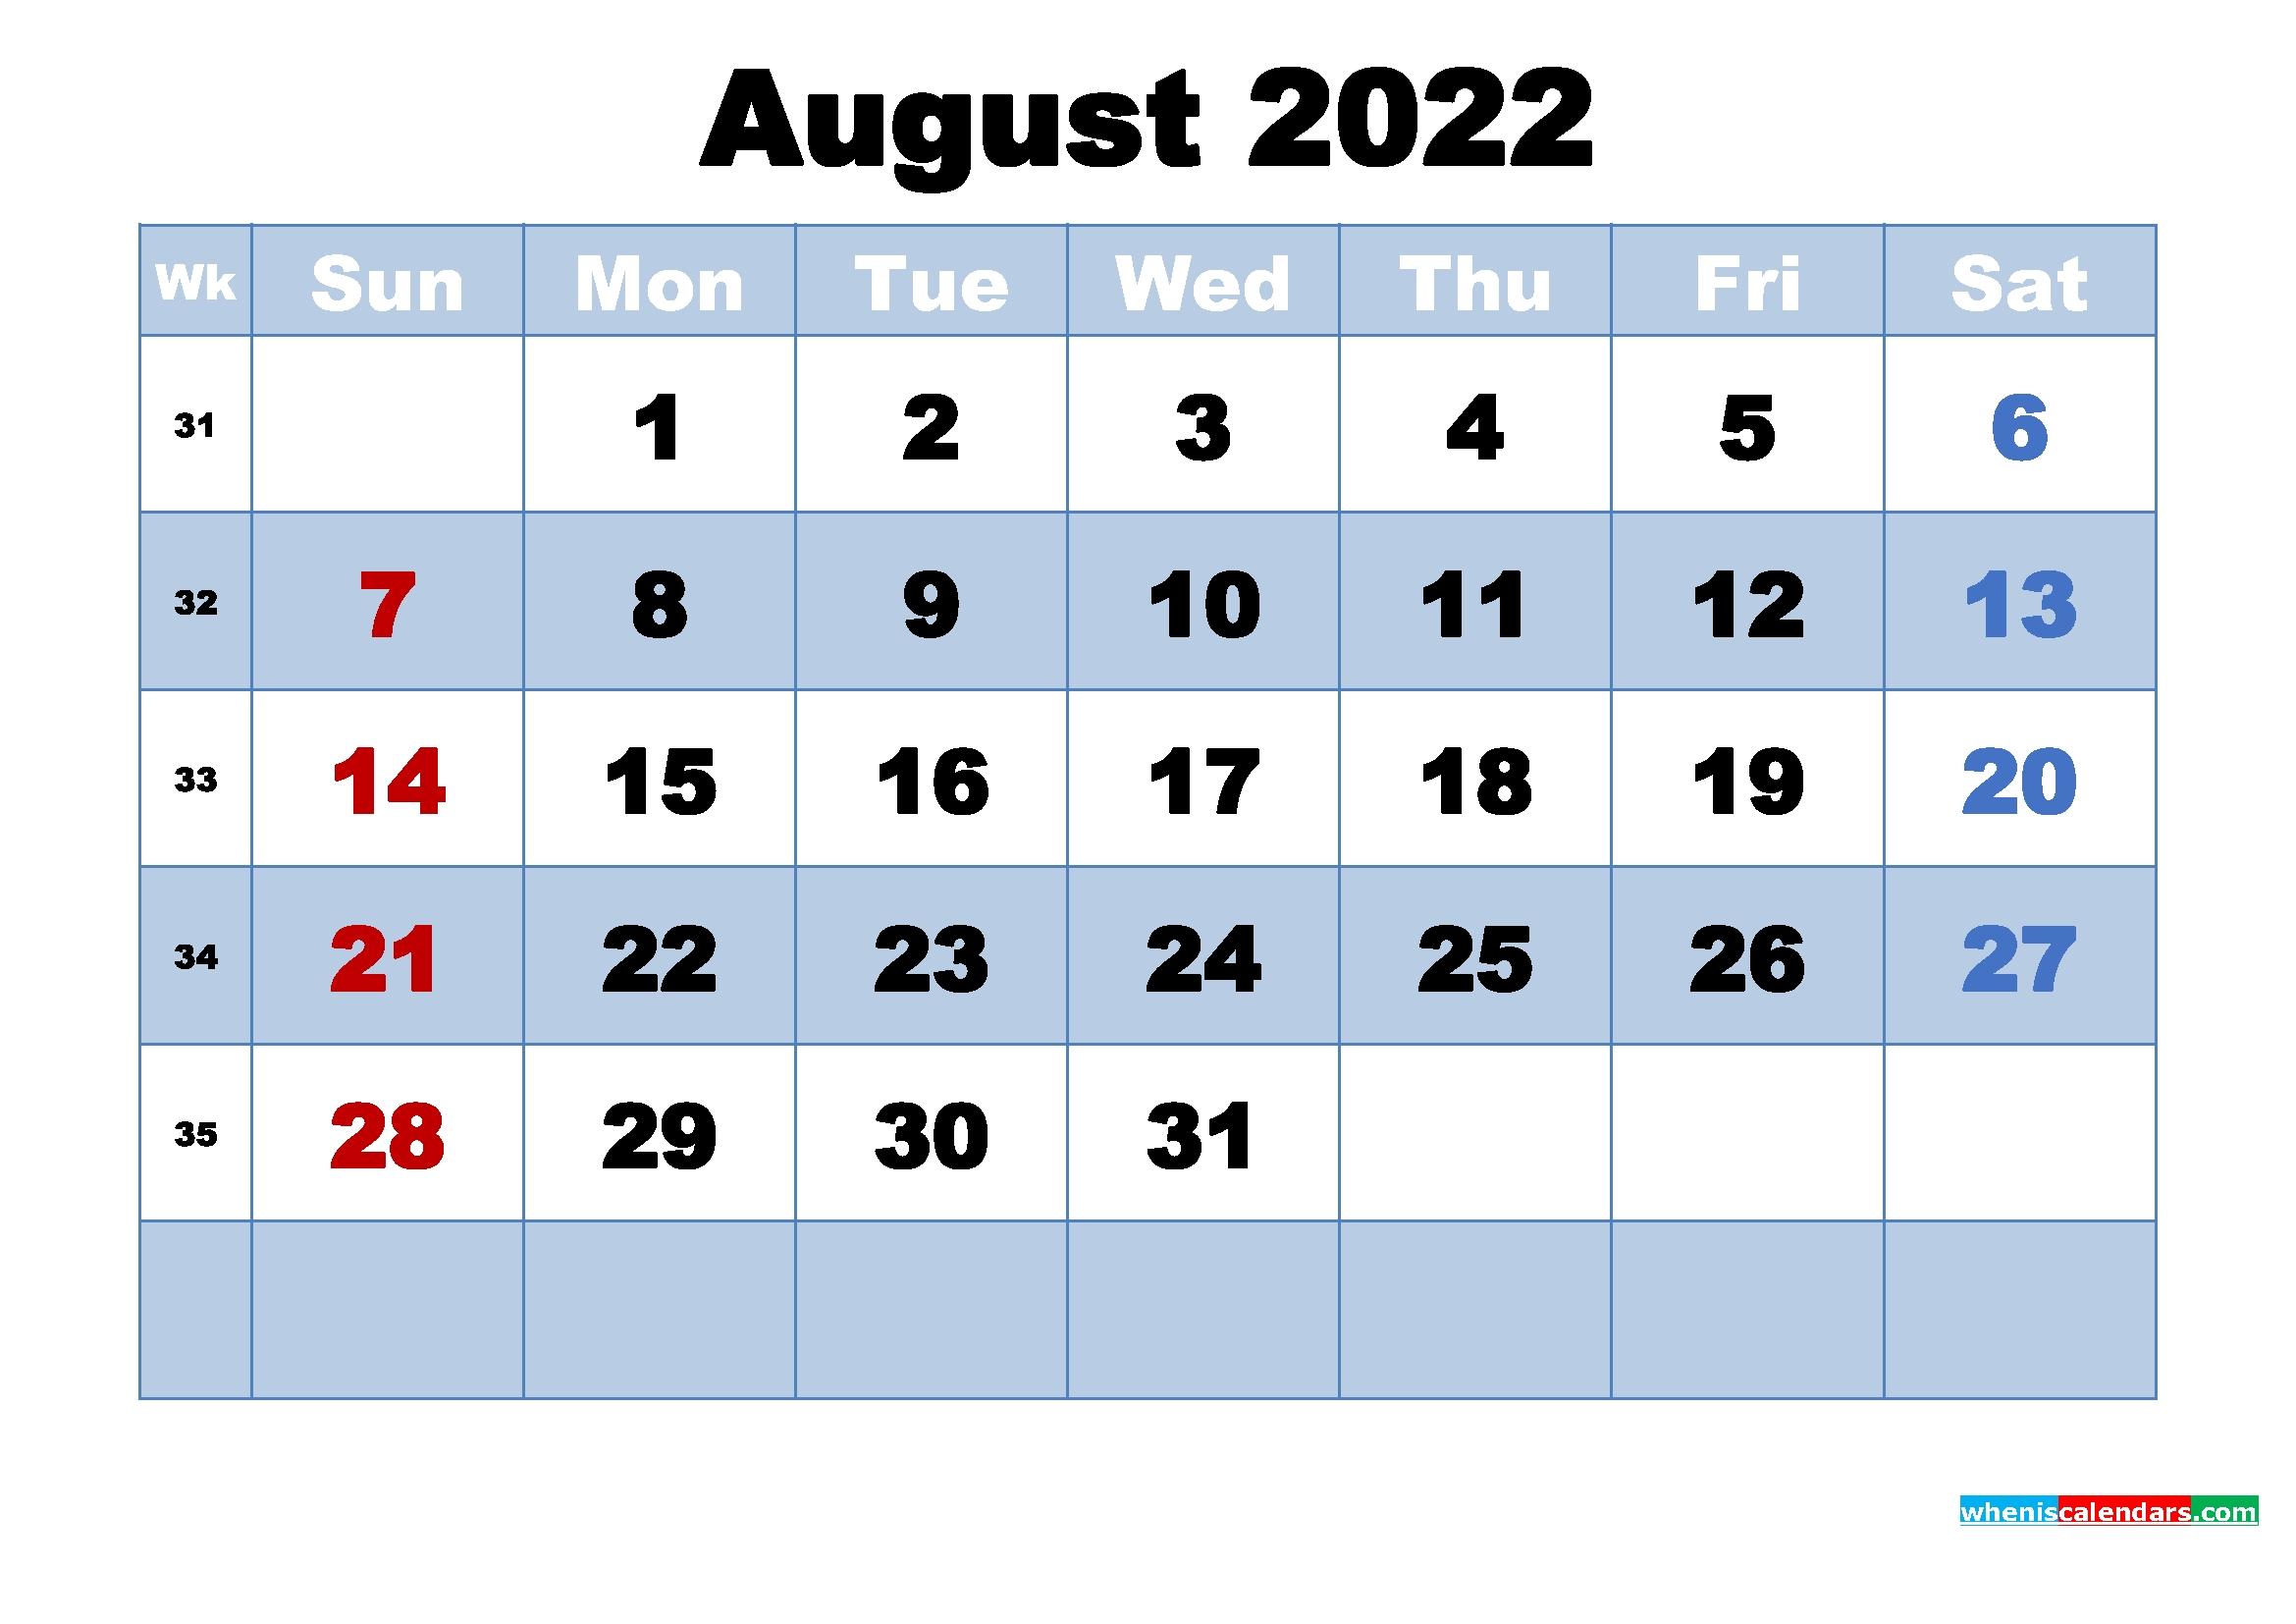 August 2022 Desktop Calendar Monthly